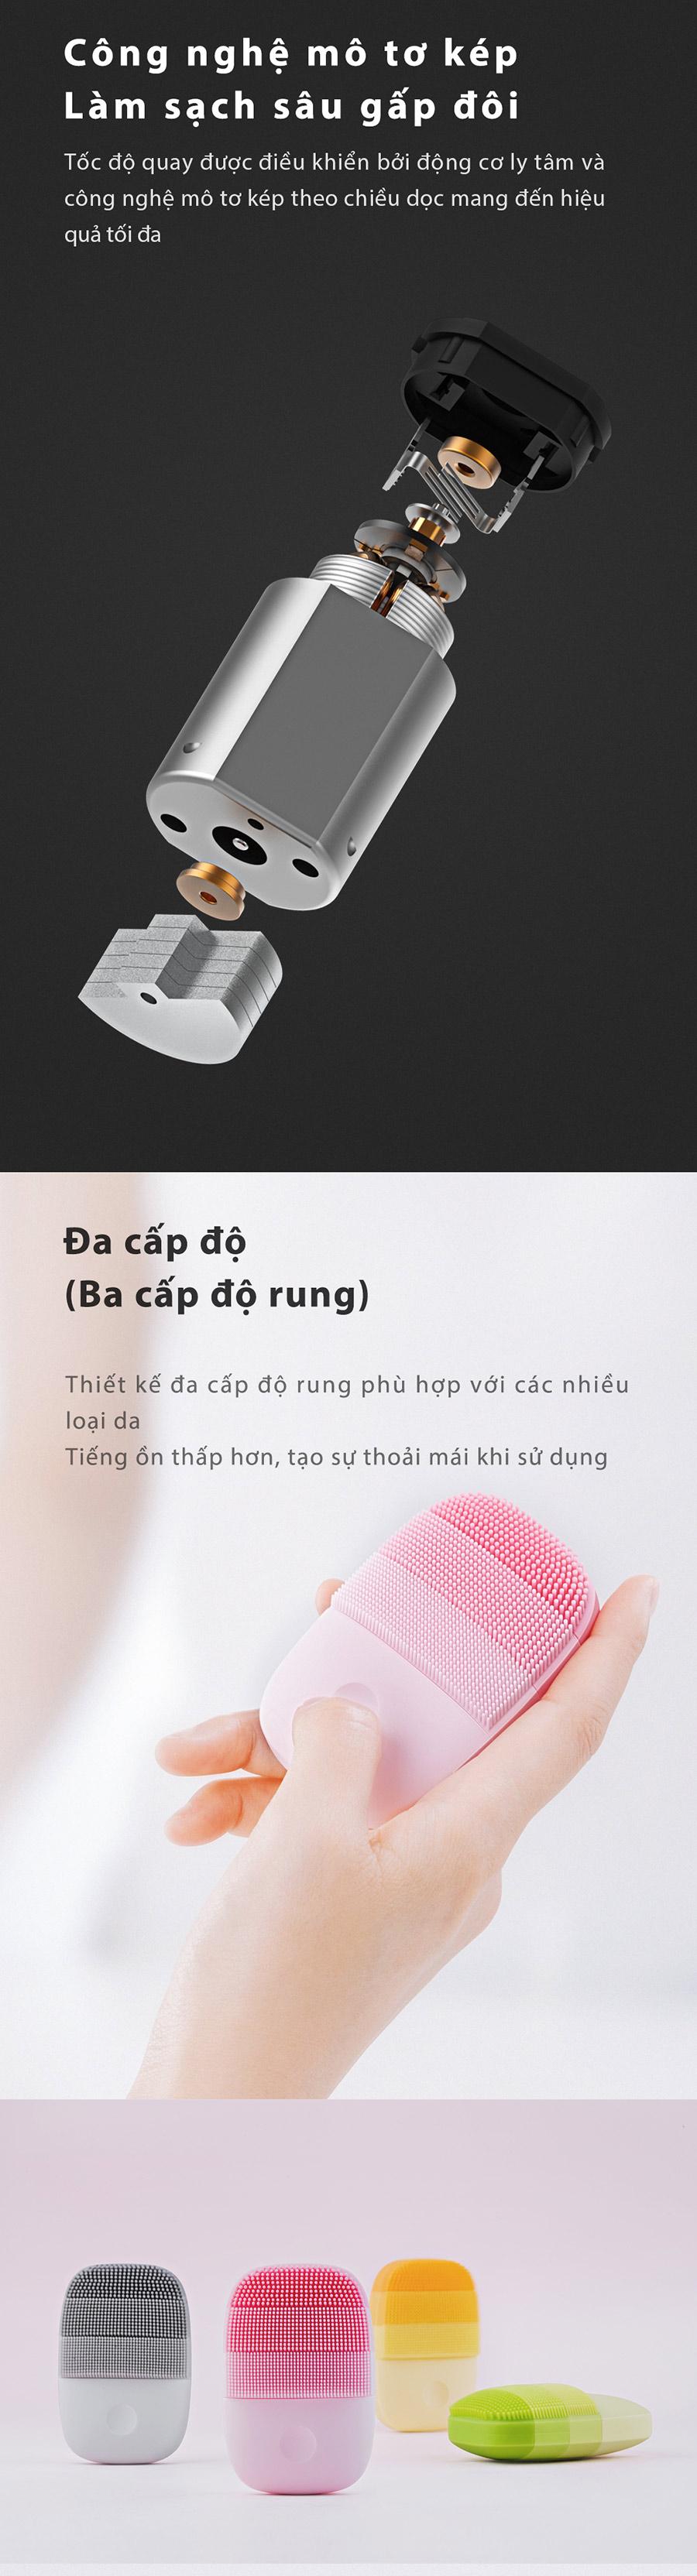 Máy rửa mặt sóng âm Xiaomi inFace